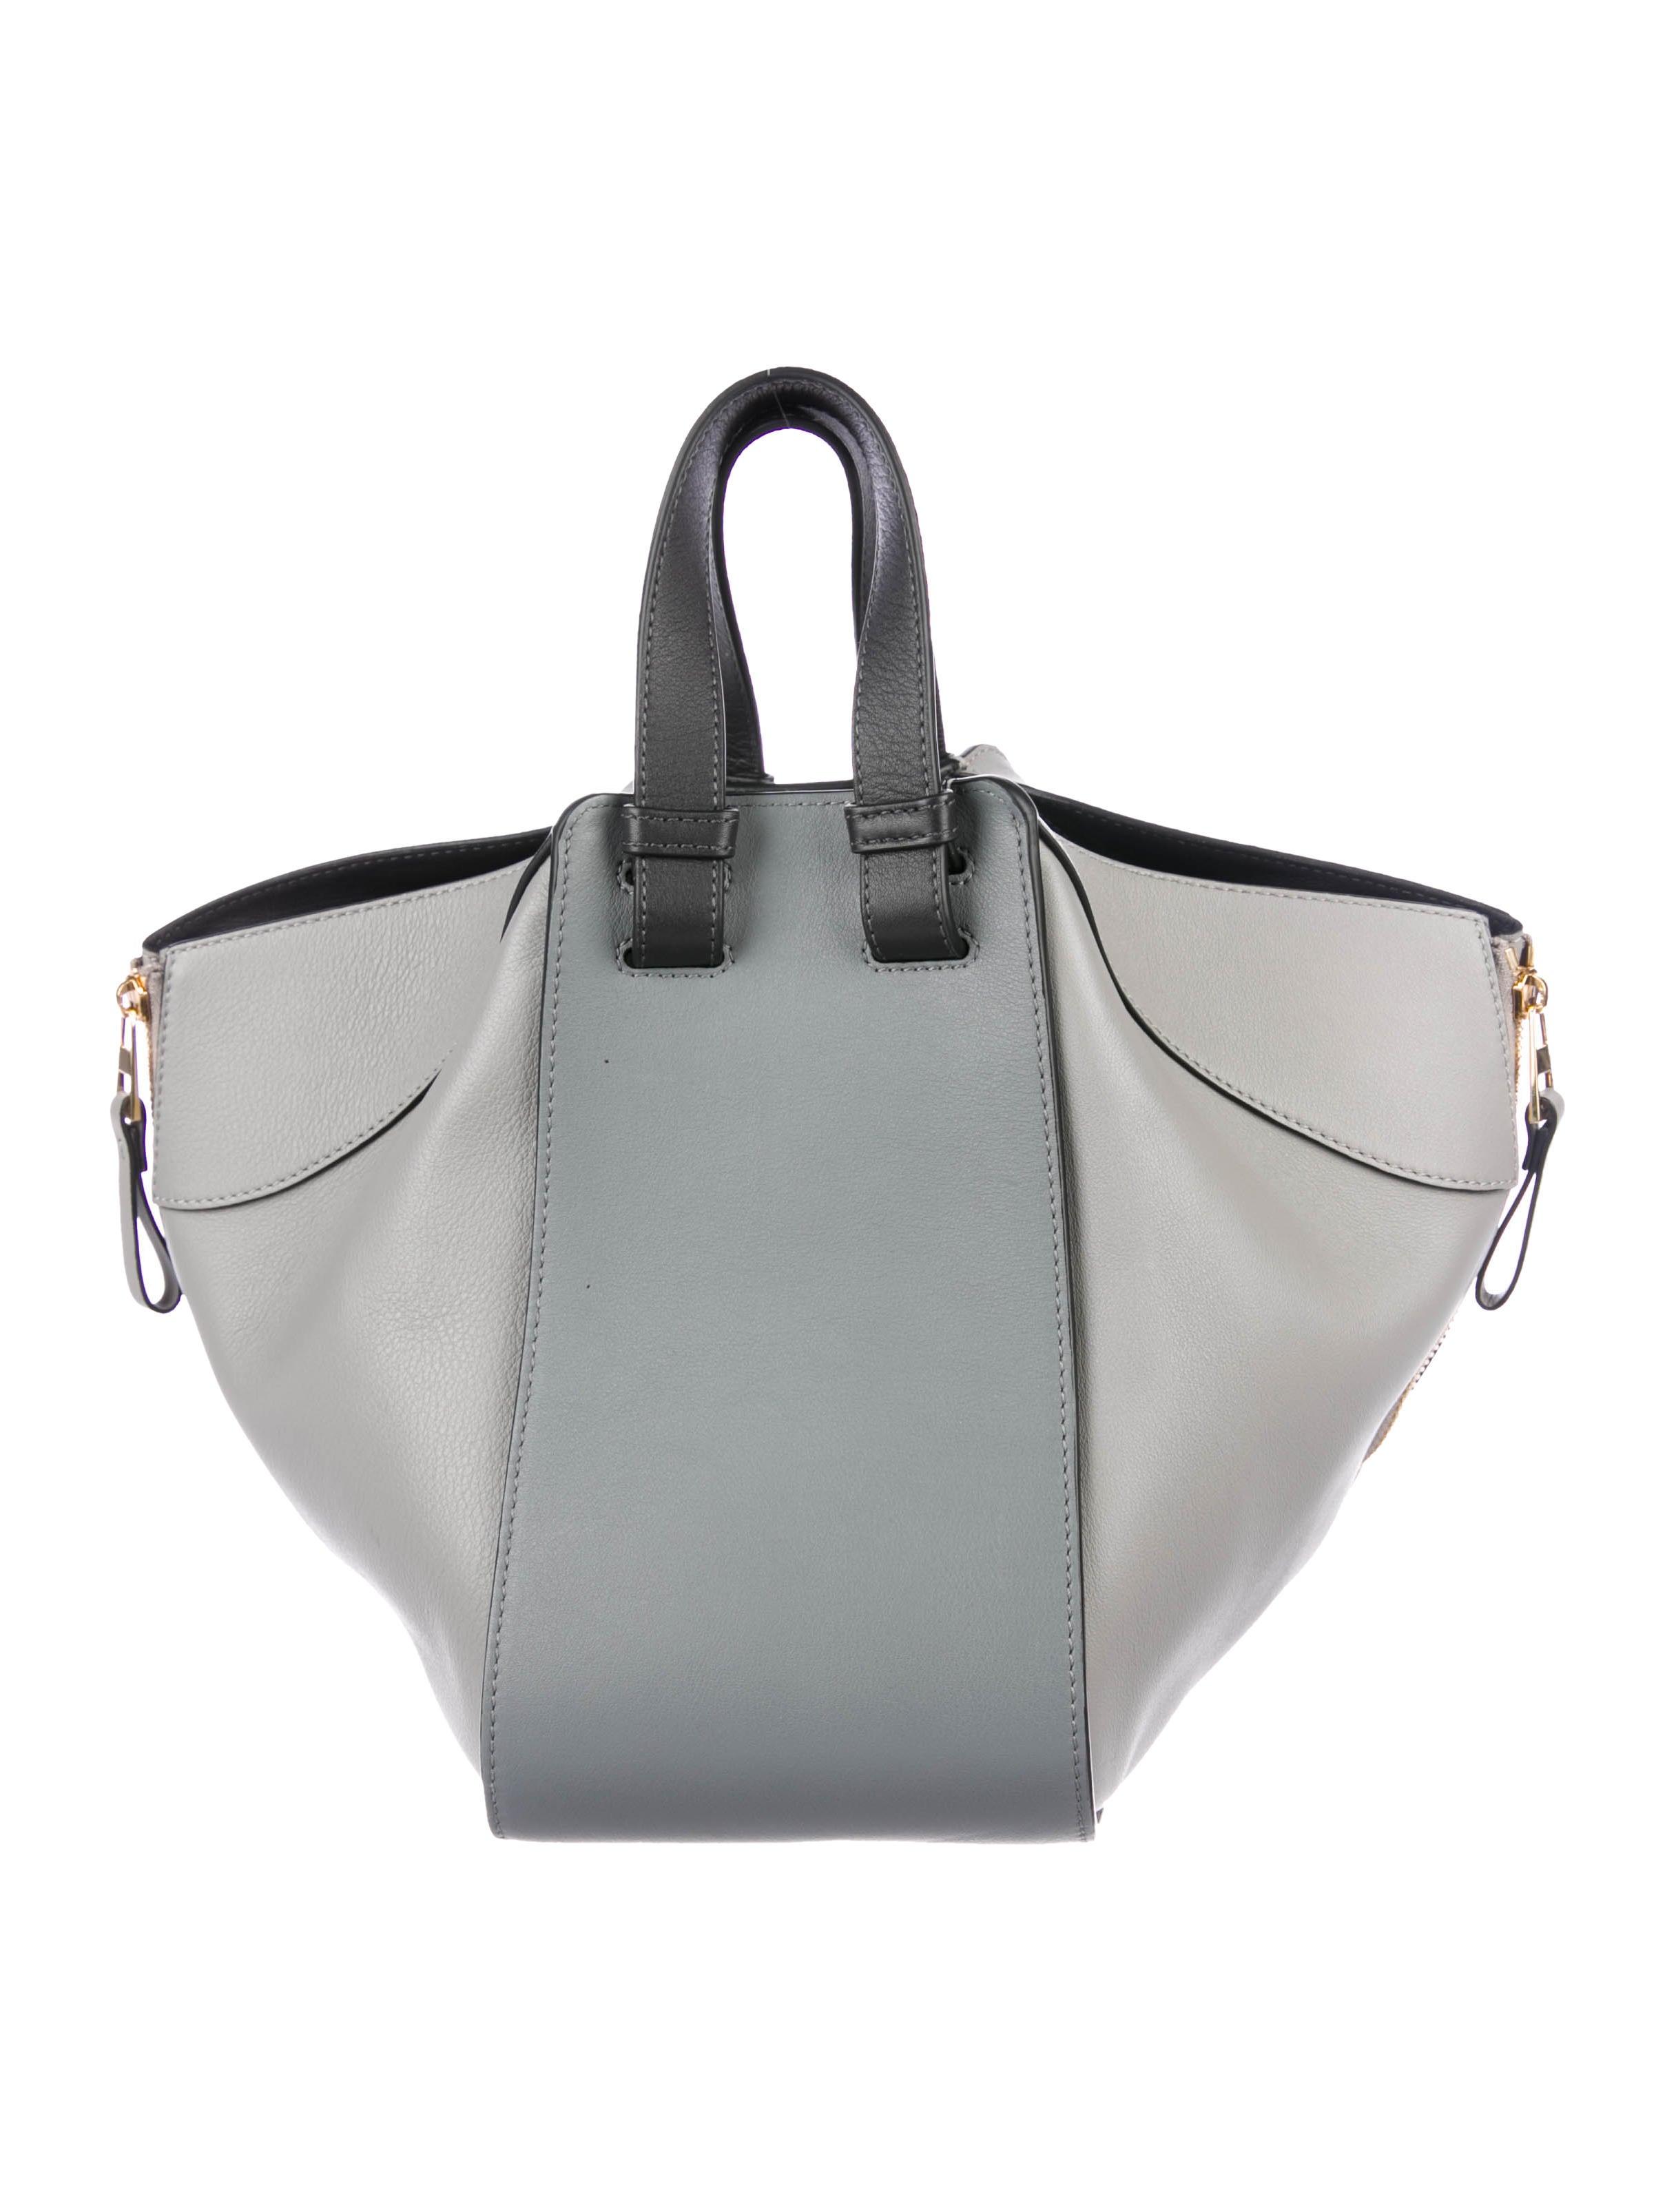 aff81fd17eb9 Loewe Small Leather Hammock Bag - Handbags - LOW23267